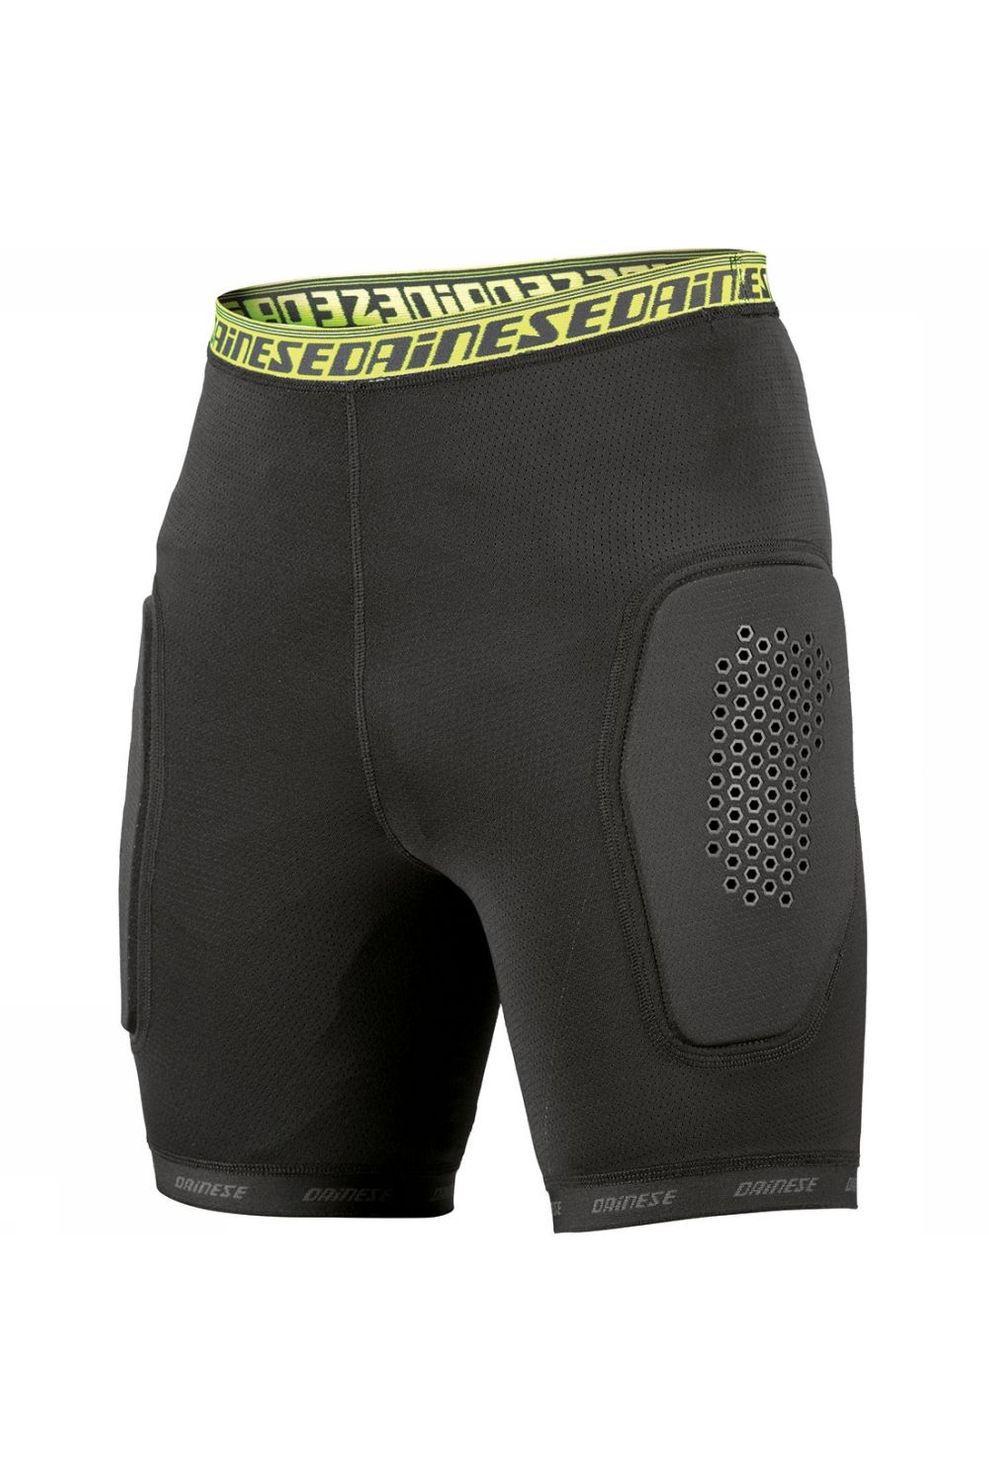 Dainese Soft Pro Shape Short Evo Impactshort Zwart